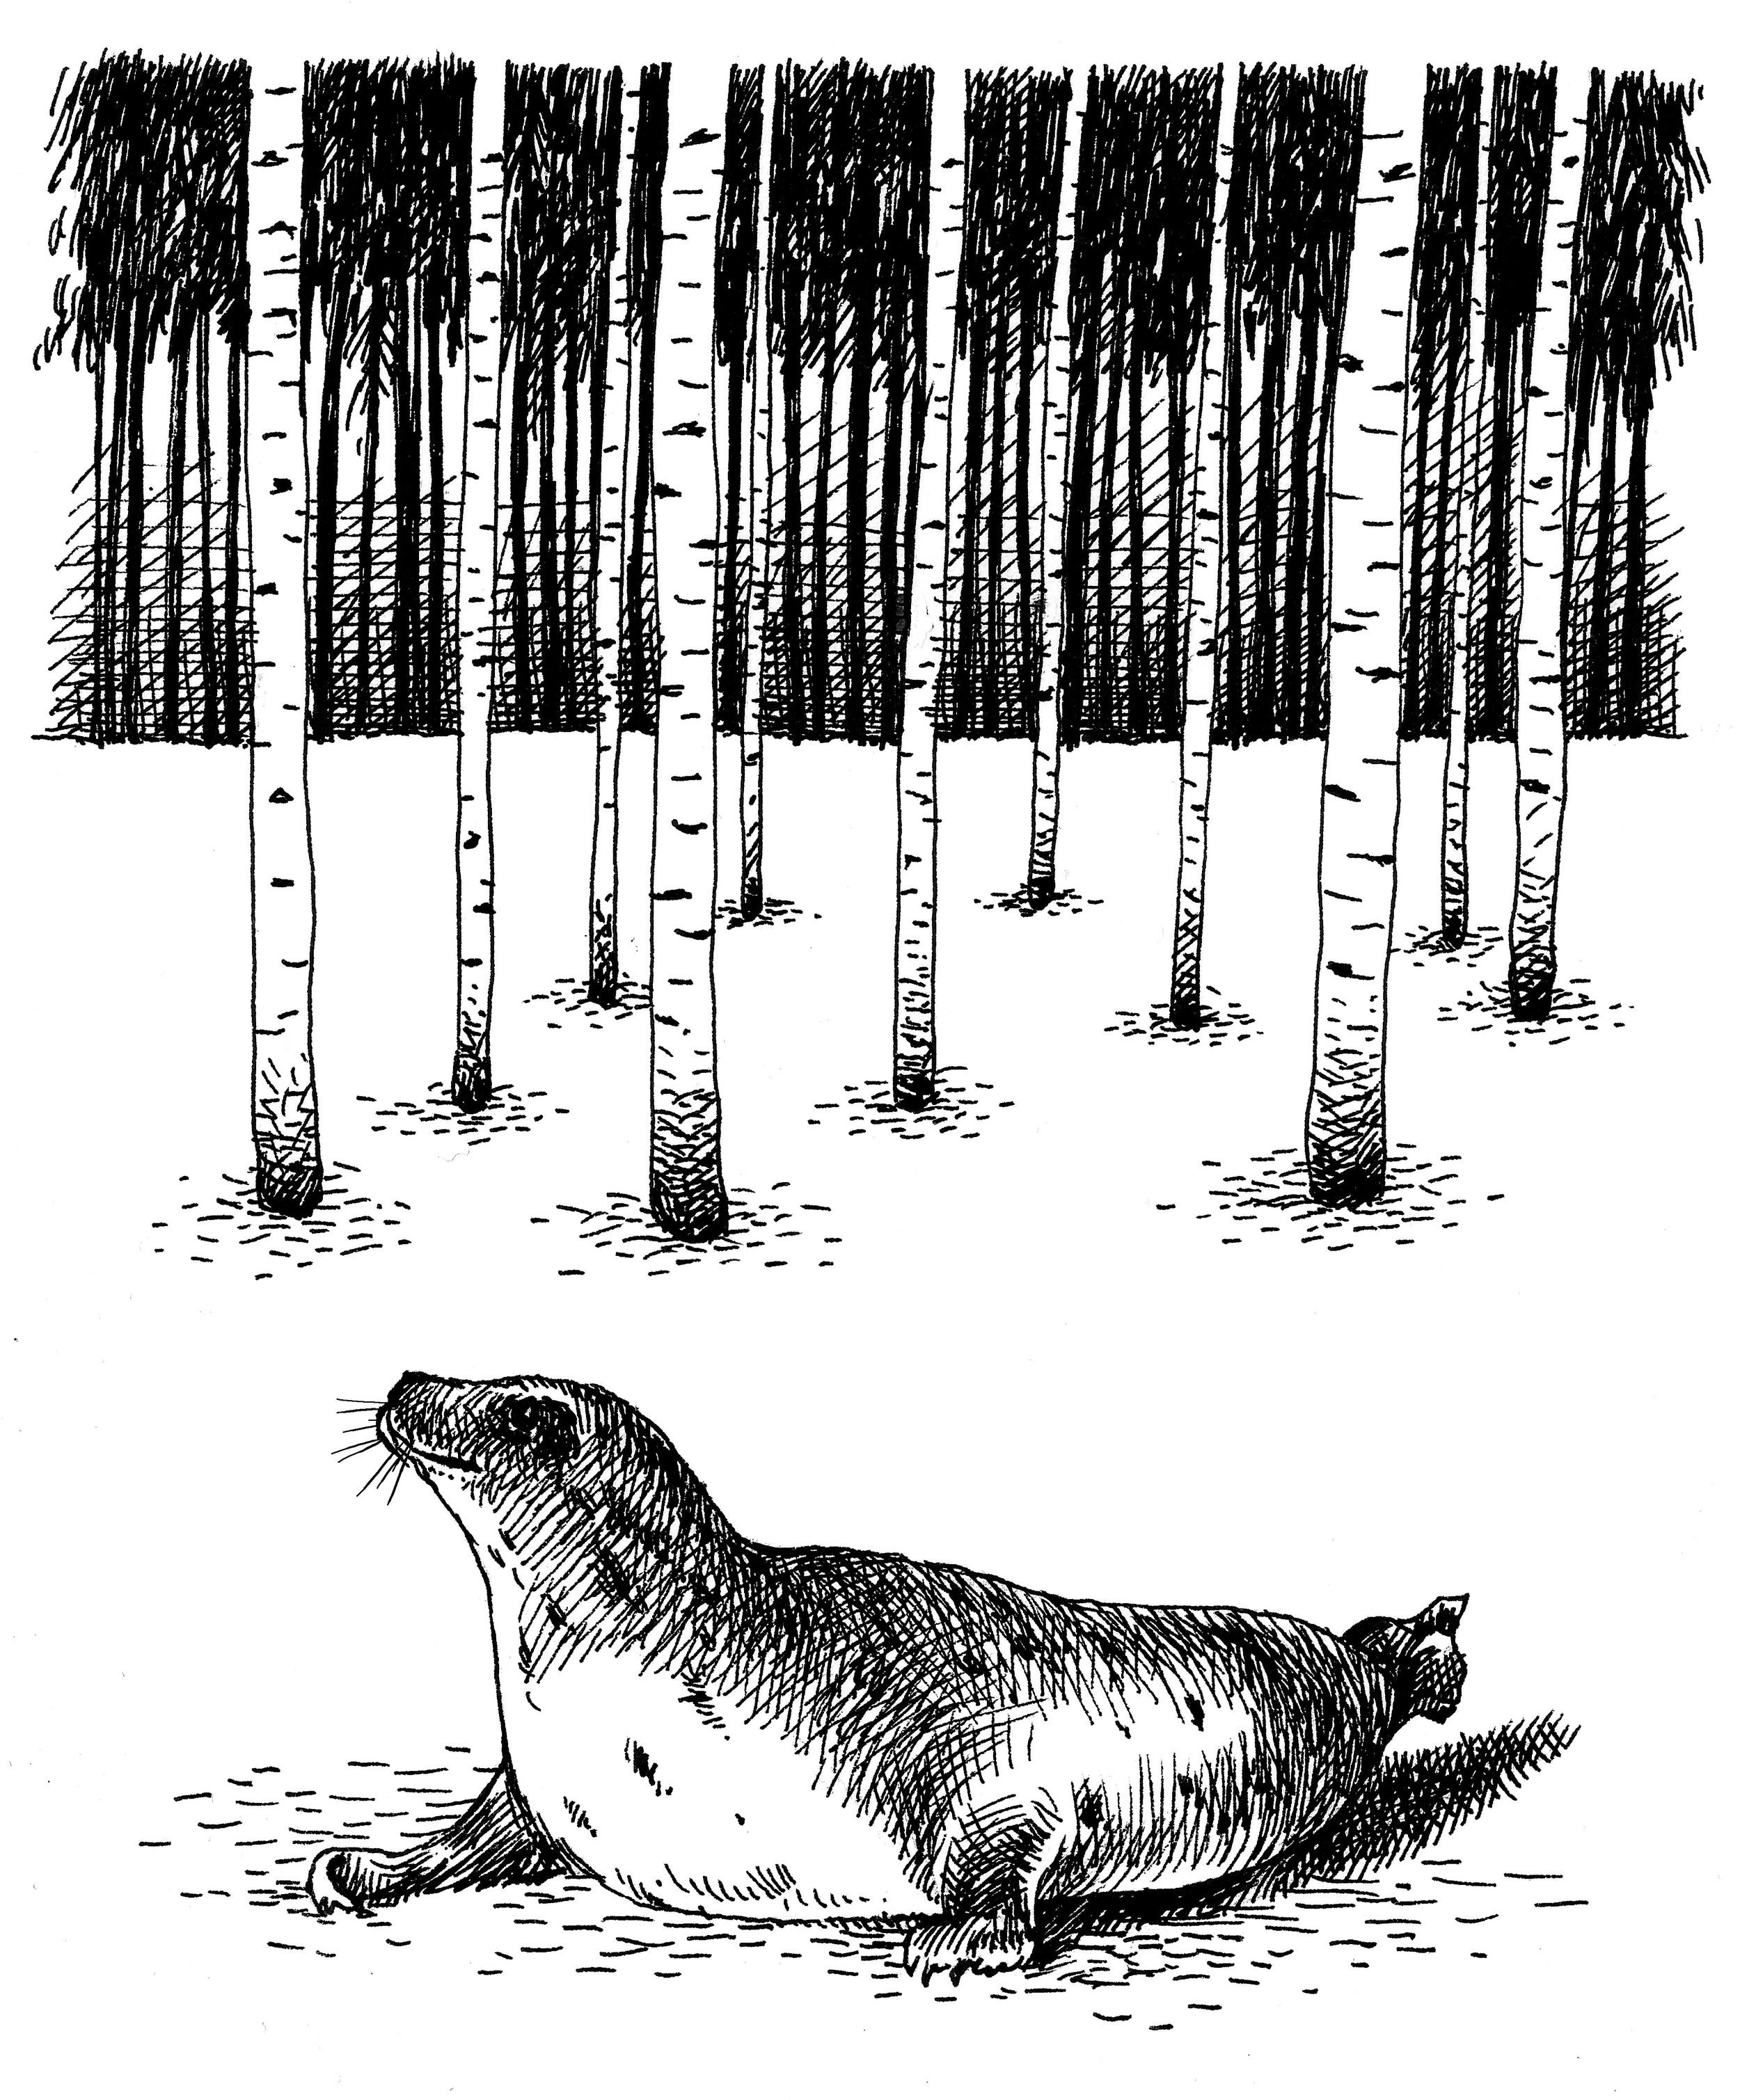 'The Last Seal'